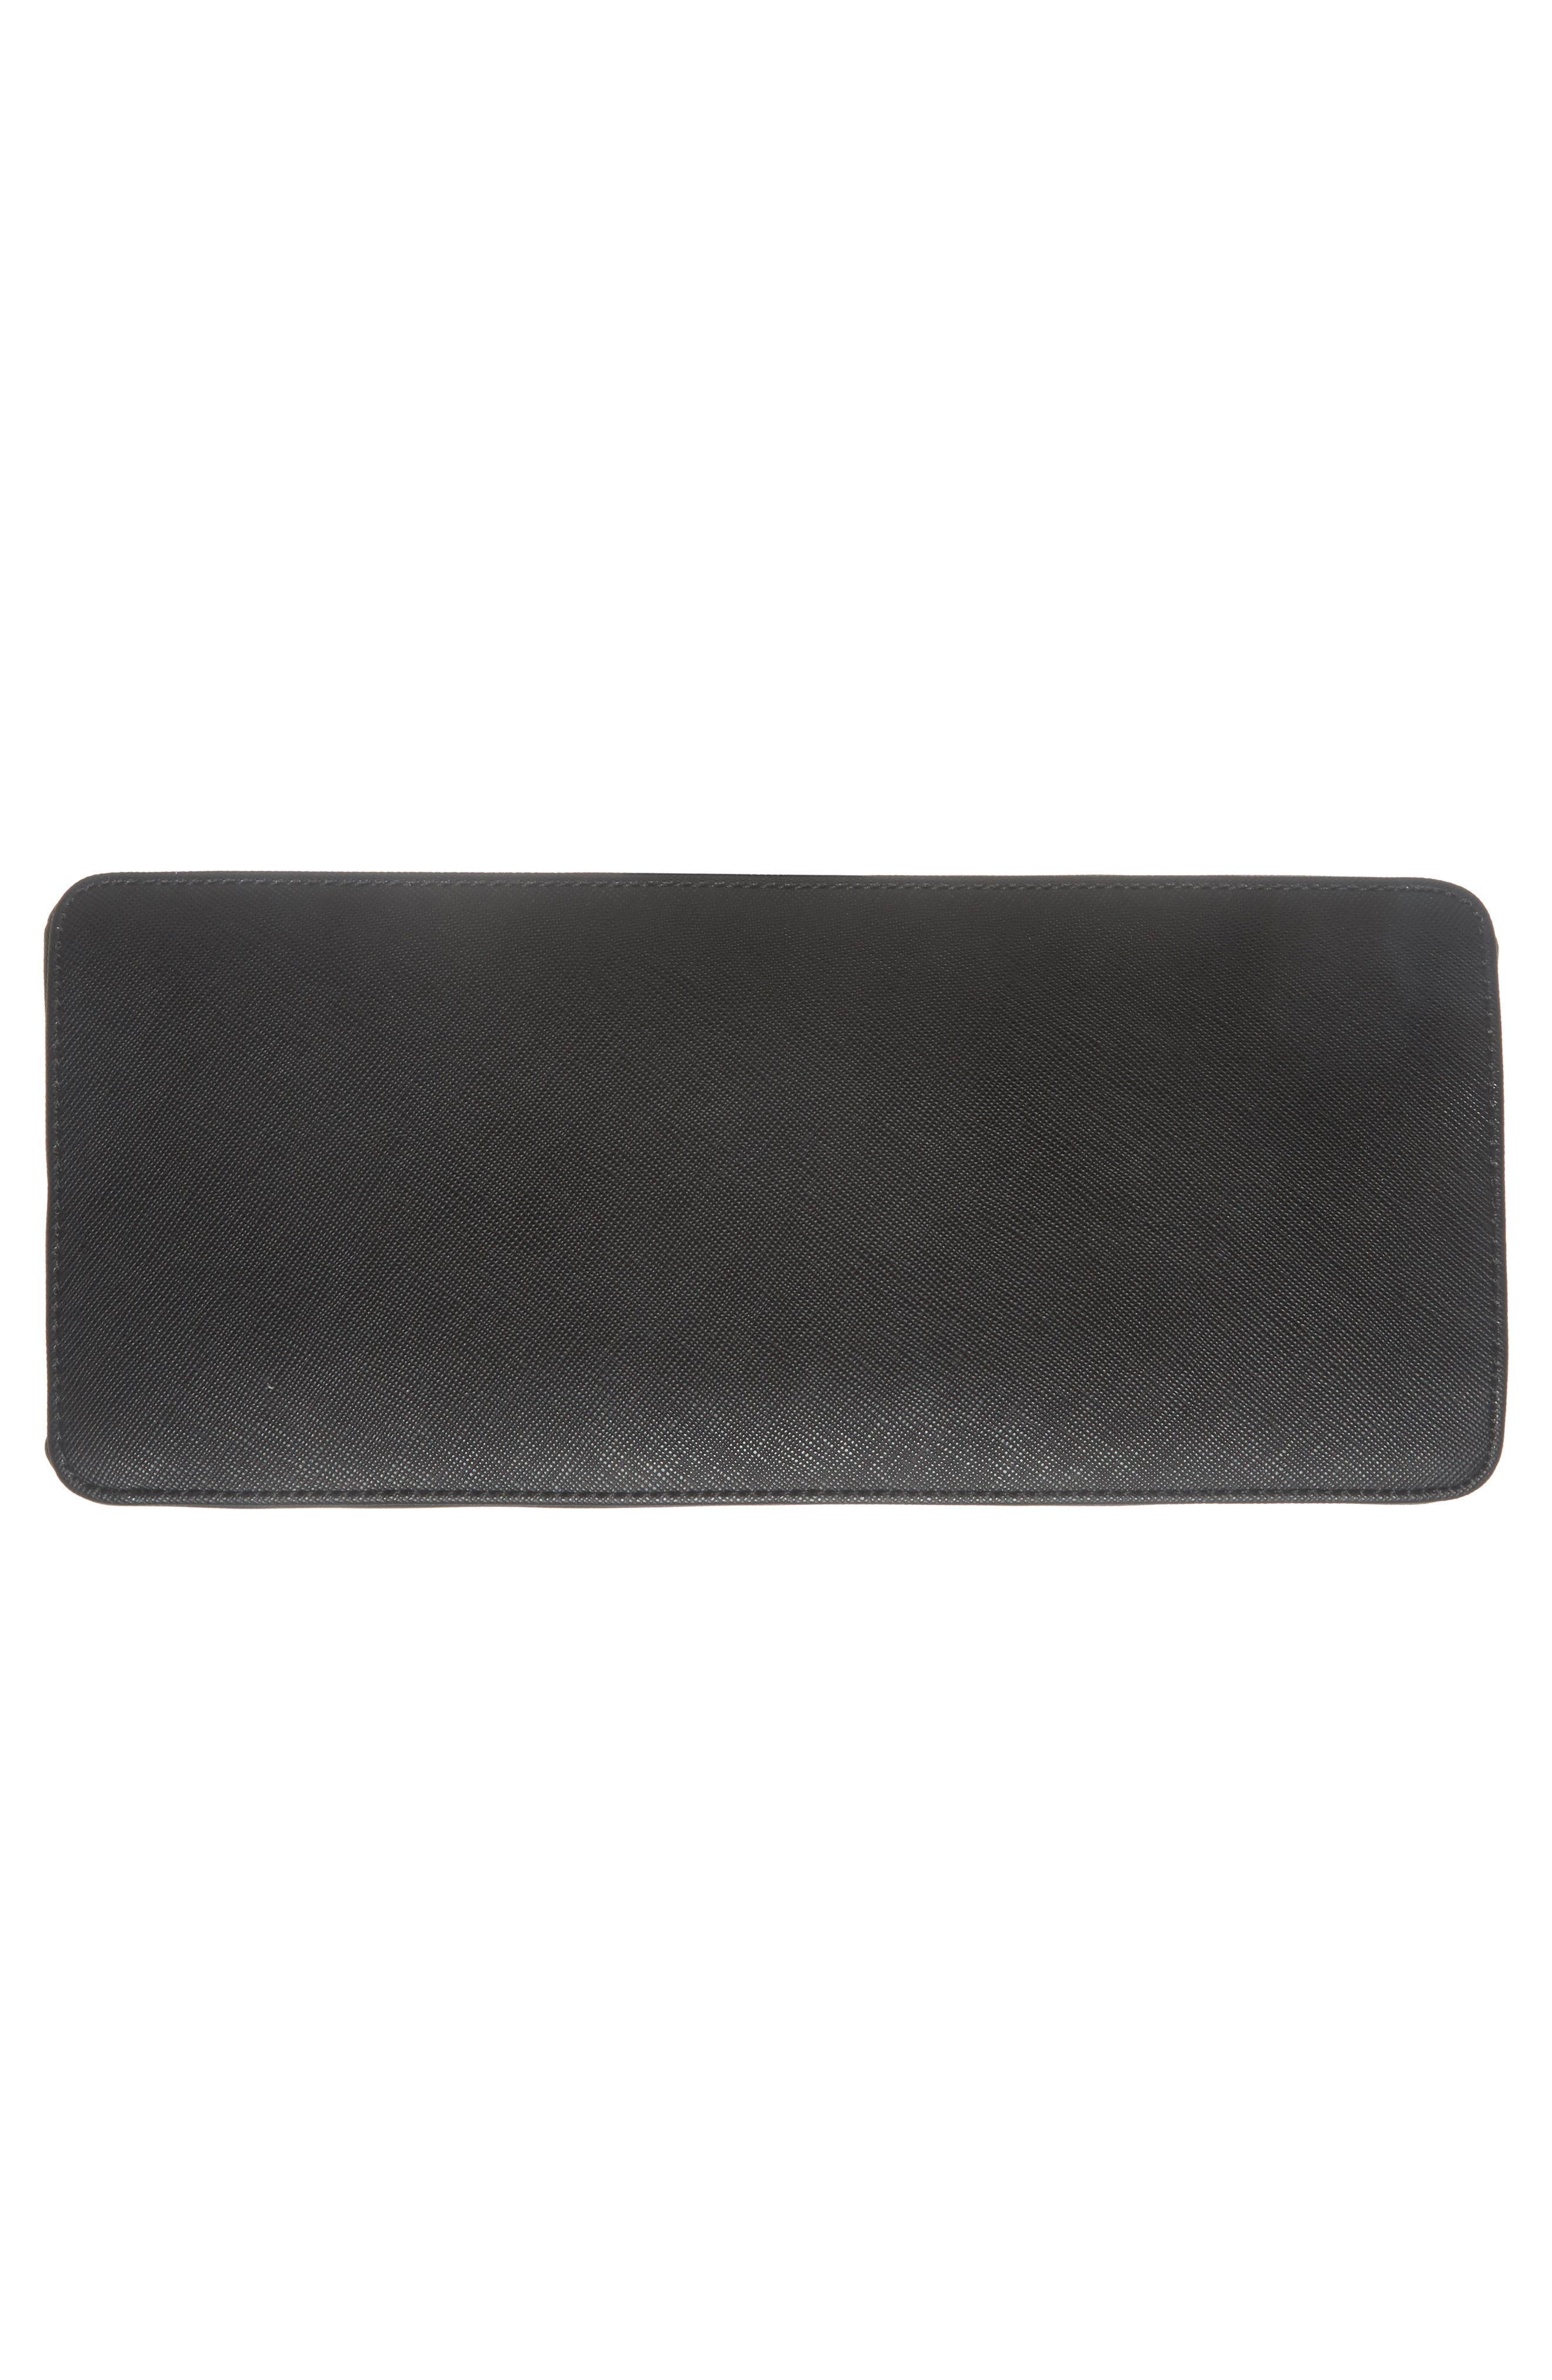 Keiira Lady Bag Faux Leather Top Handle Satchel,                             Alternate thumbnail 6, color,                             001